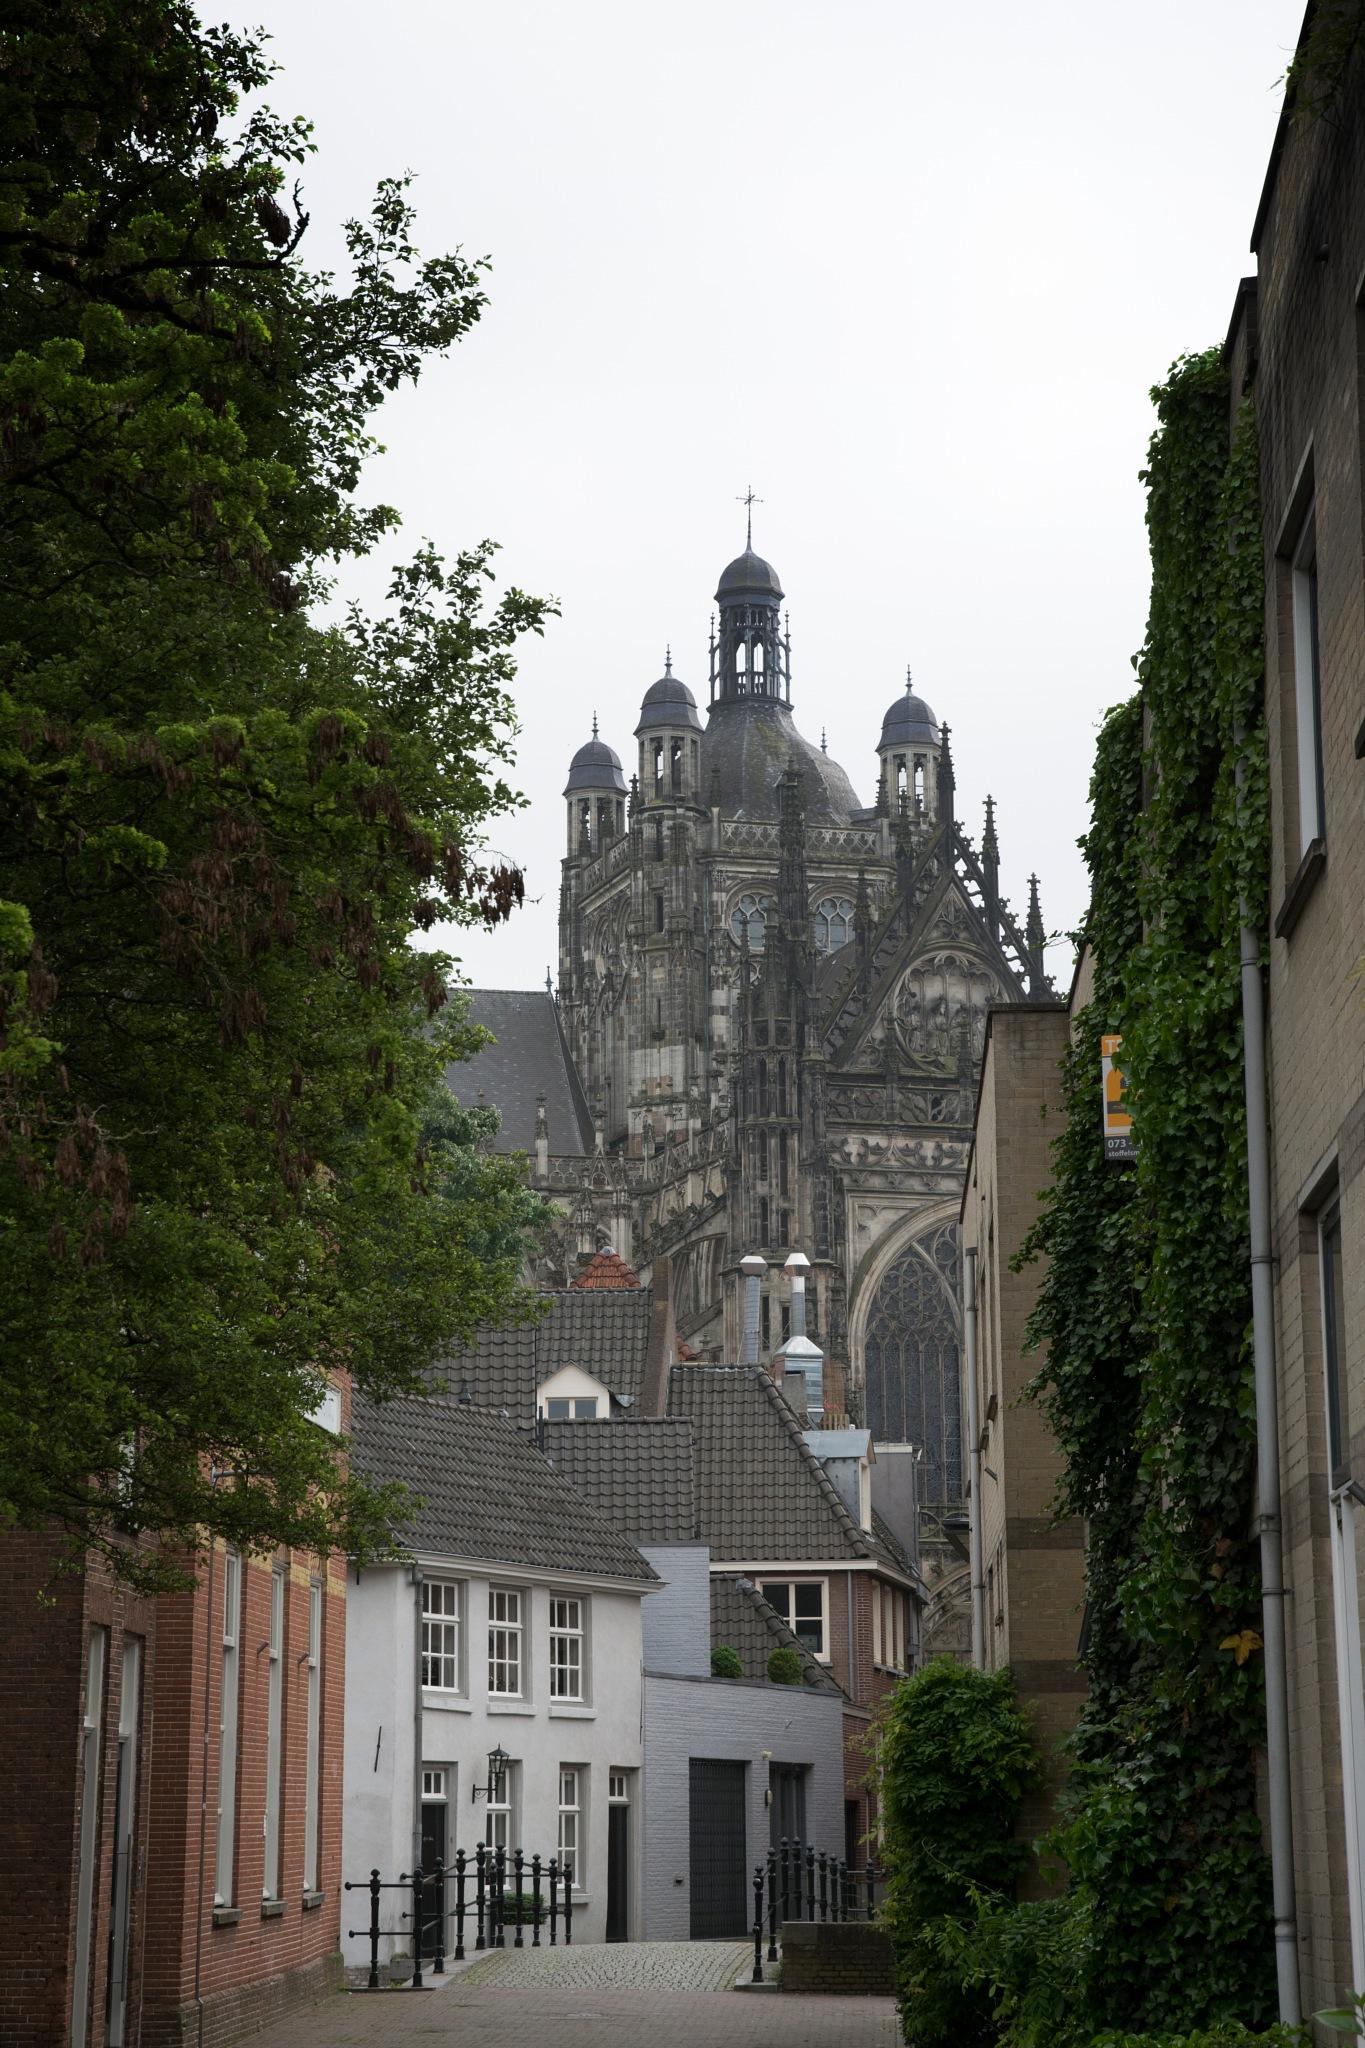 St Jan Church in Den Bosch by Walther Burg